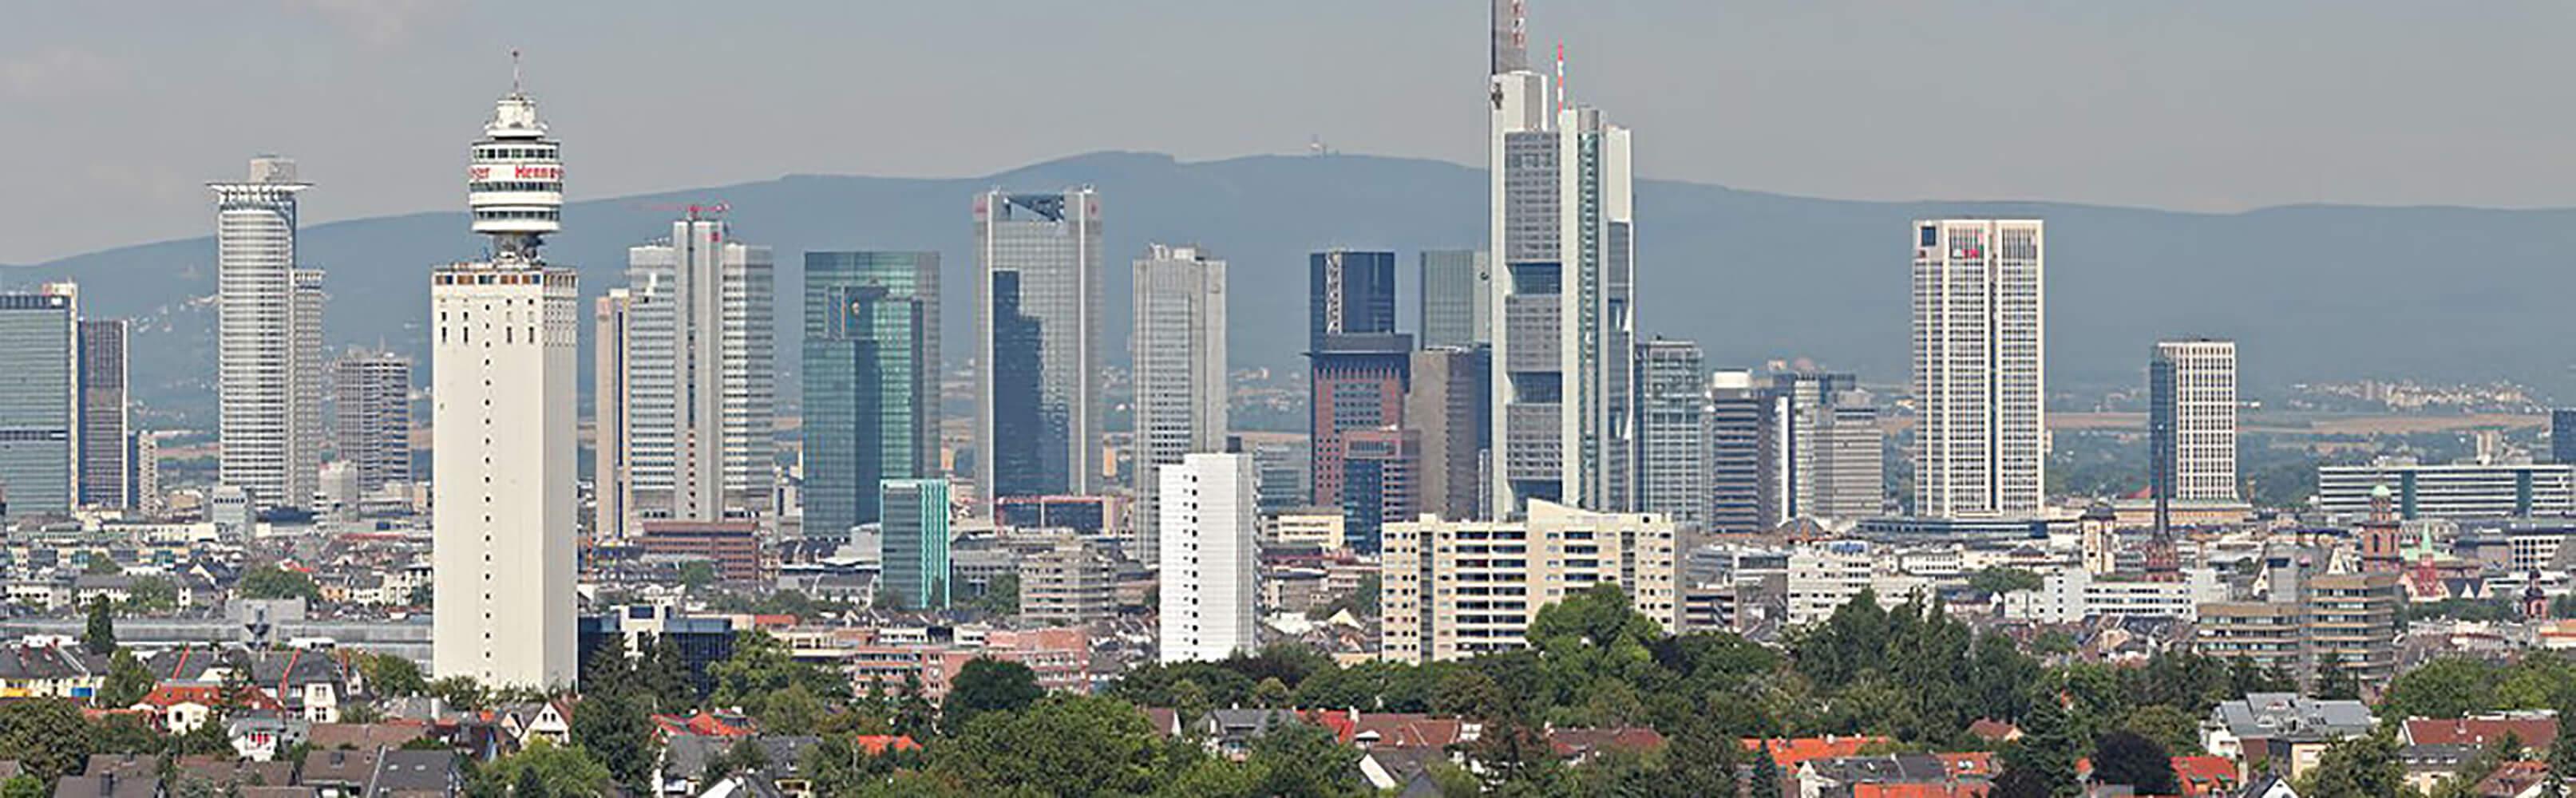 Frankfurt am Main 1